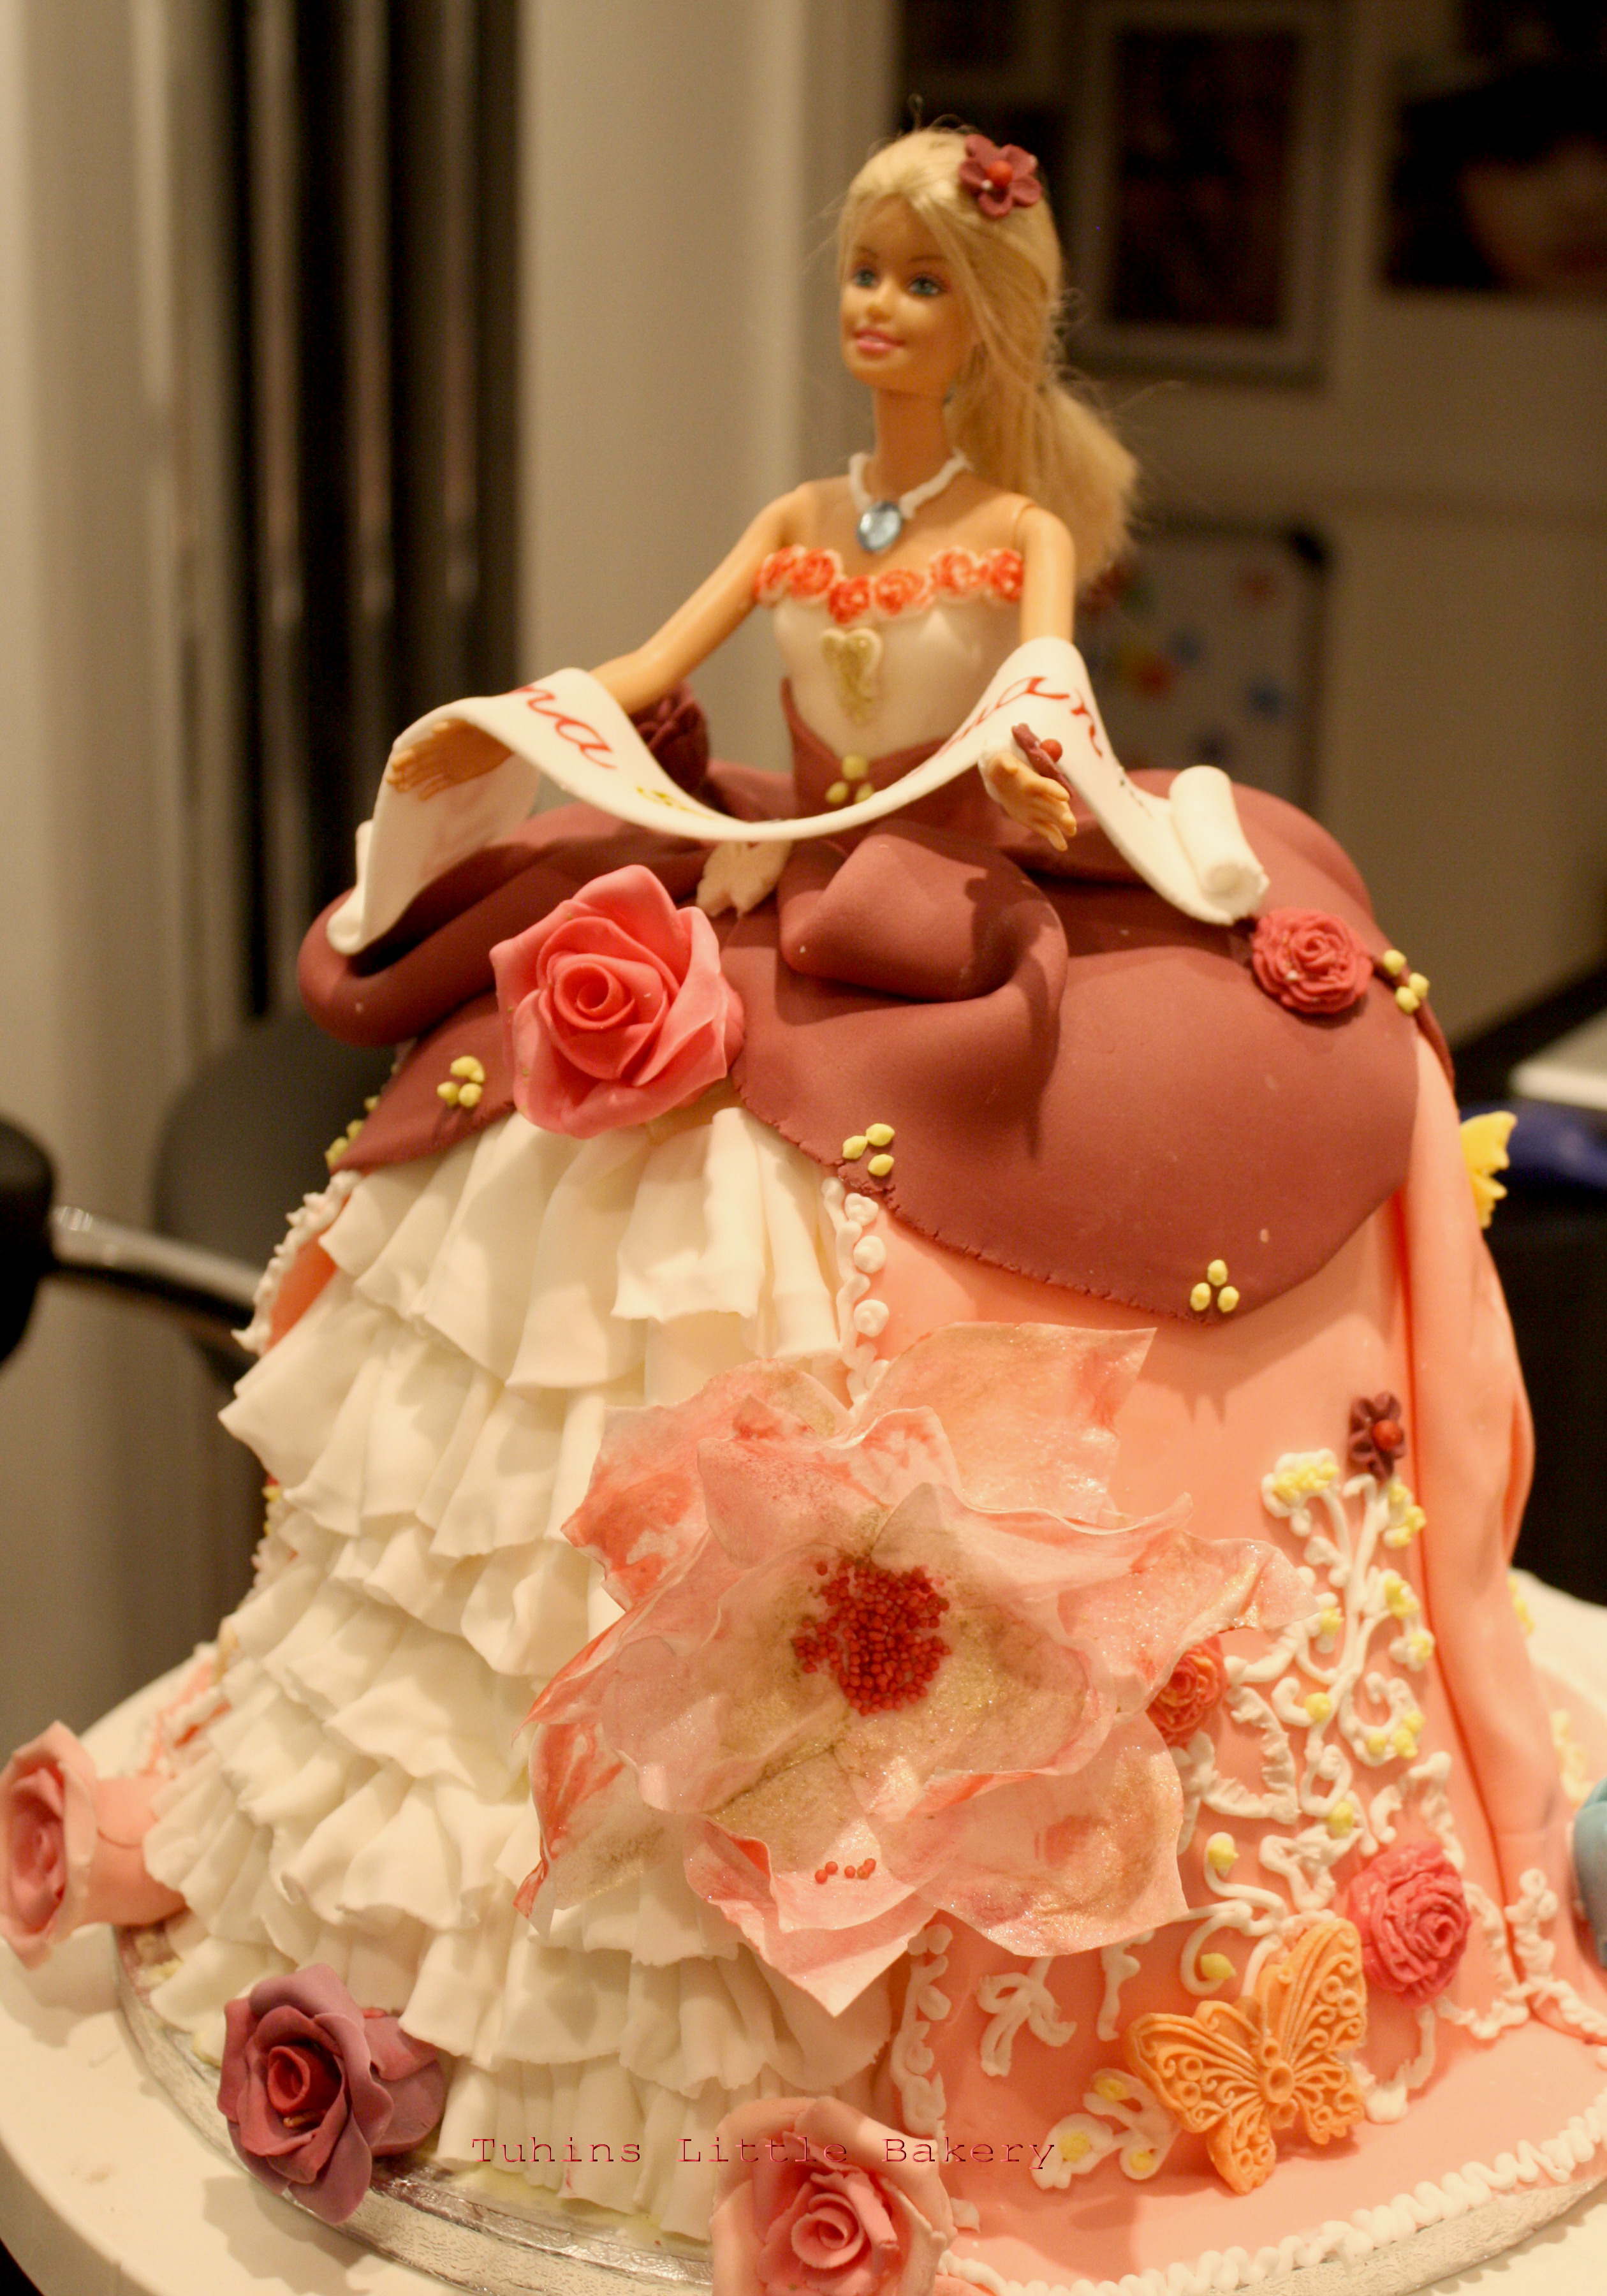 Princess Cake The Great British Bake Off